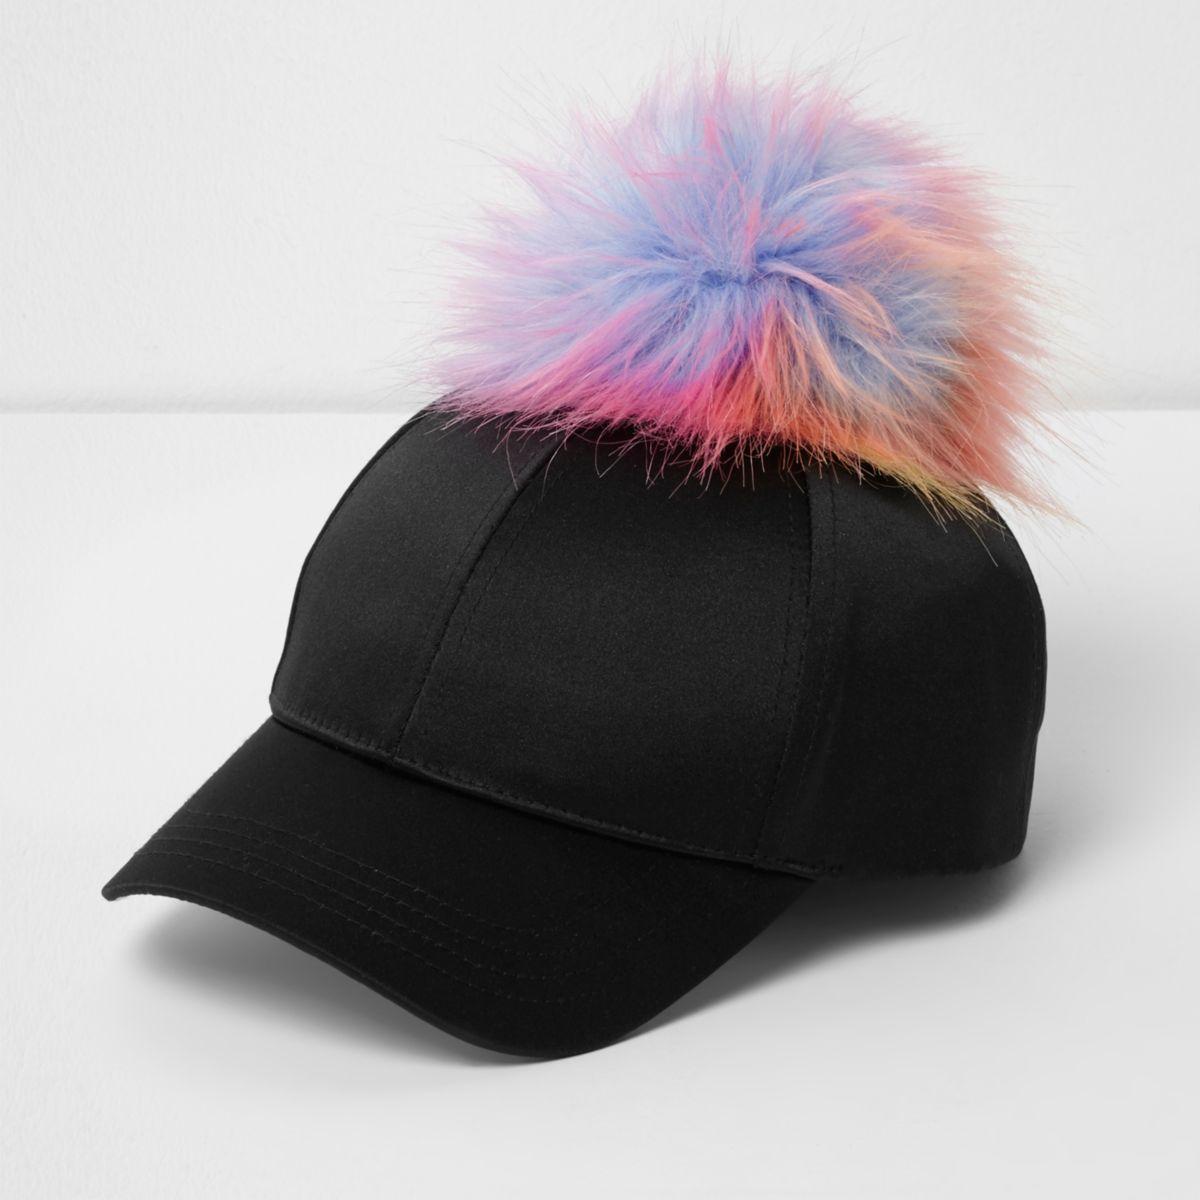 Girls black satin pom pom baseball cap